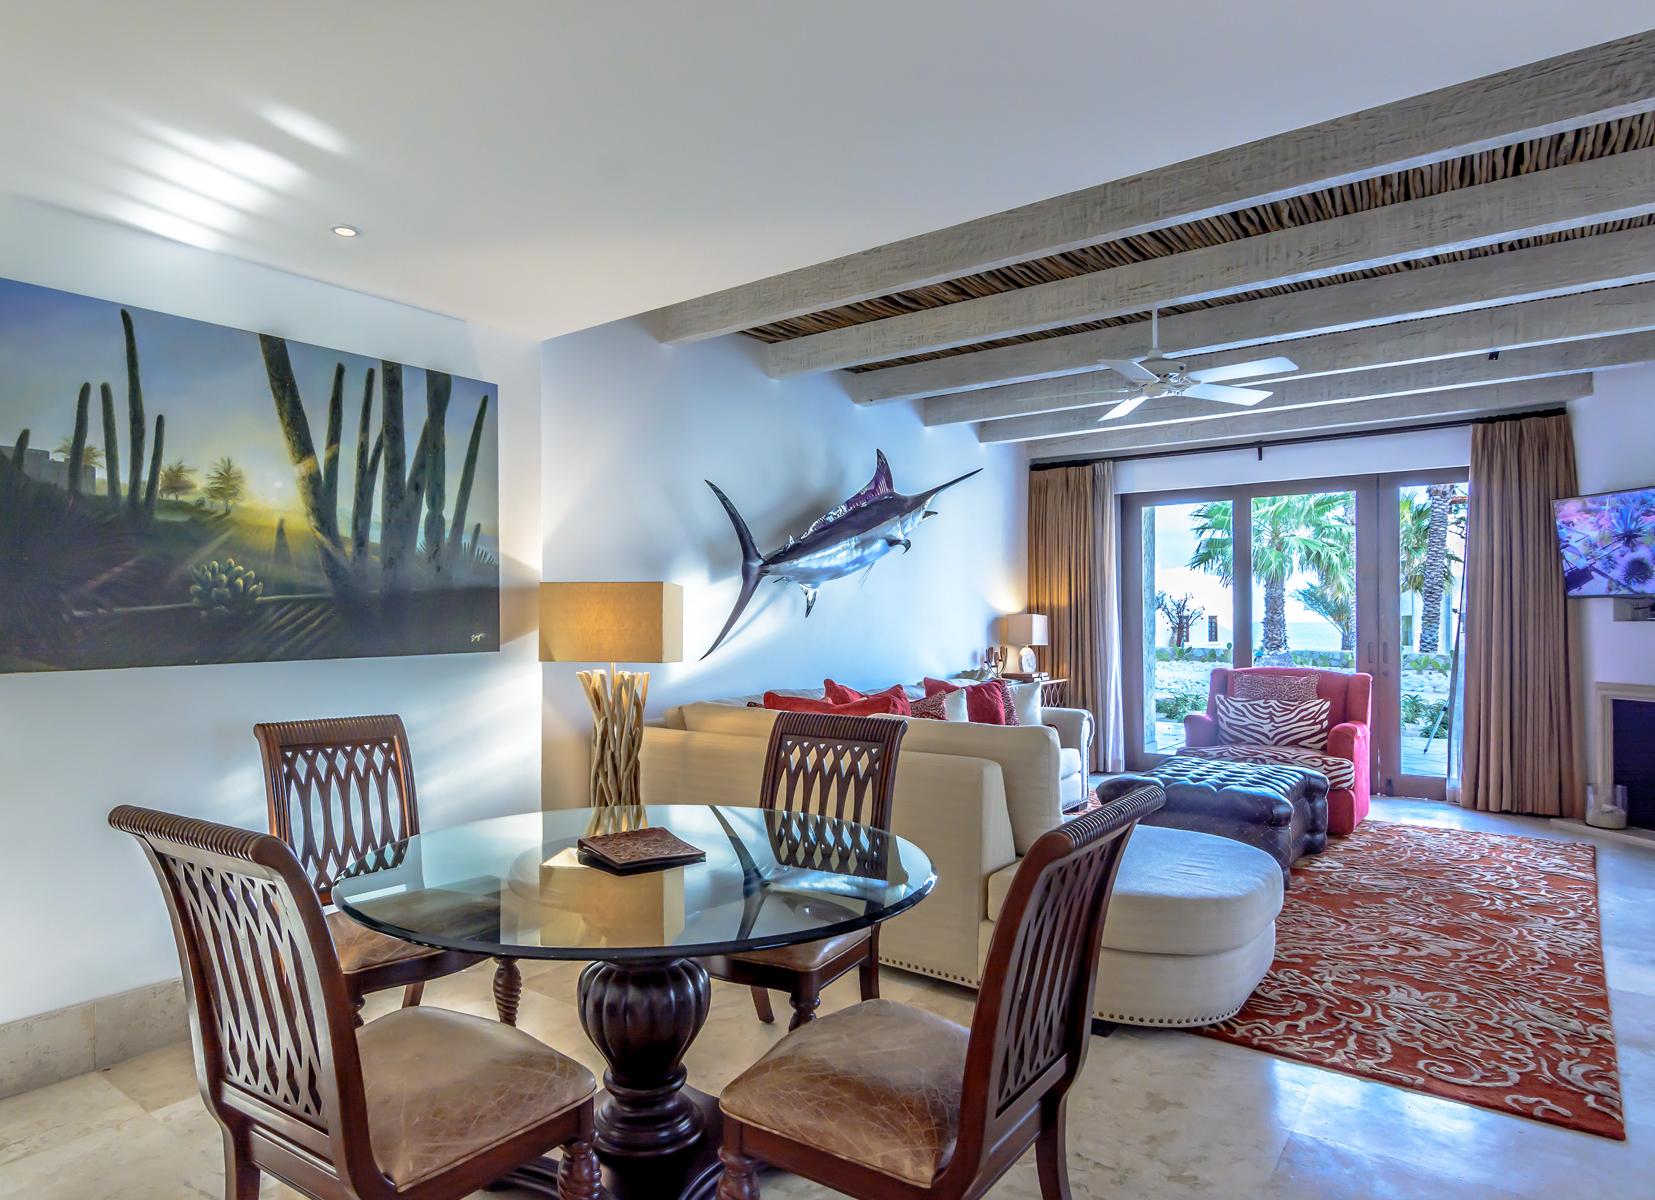 Additional photo for property listing at Las Ventanas al Paraíso Residence 3103 San Jose Del Cabo, Baja California Sur México